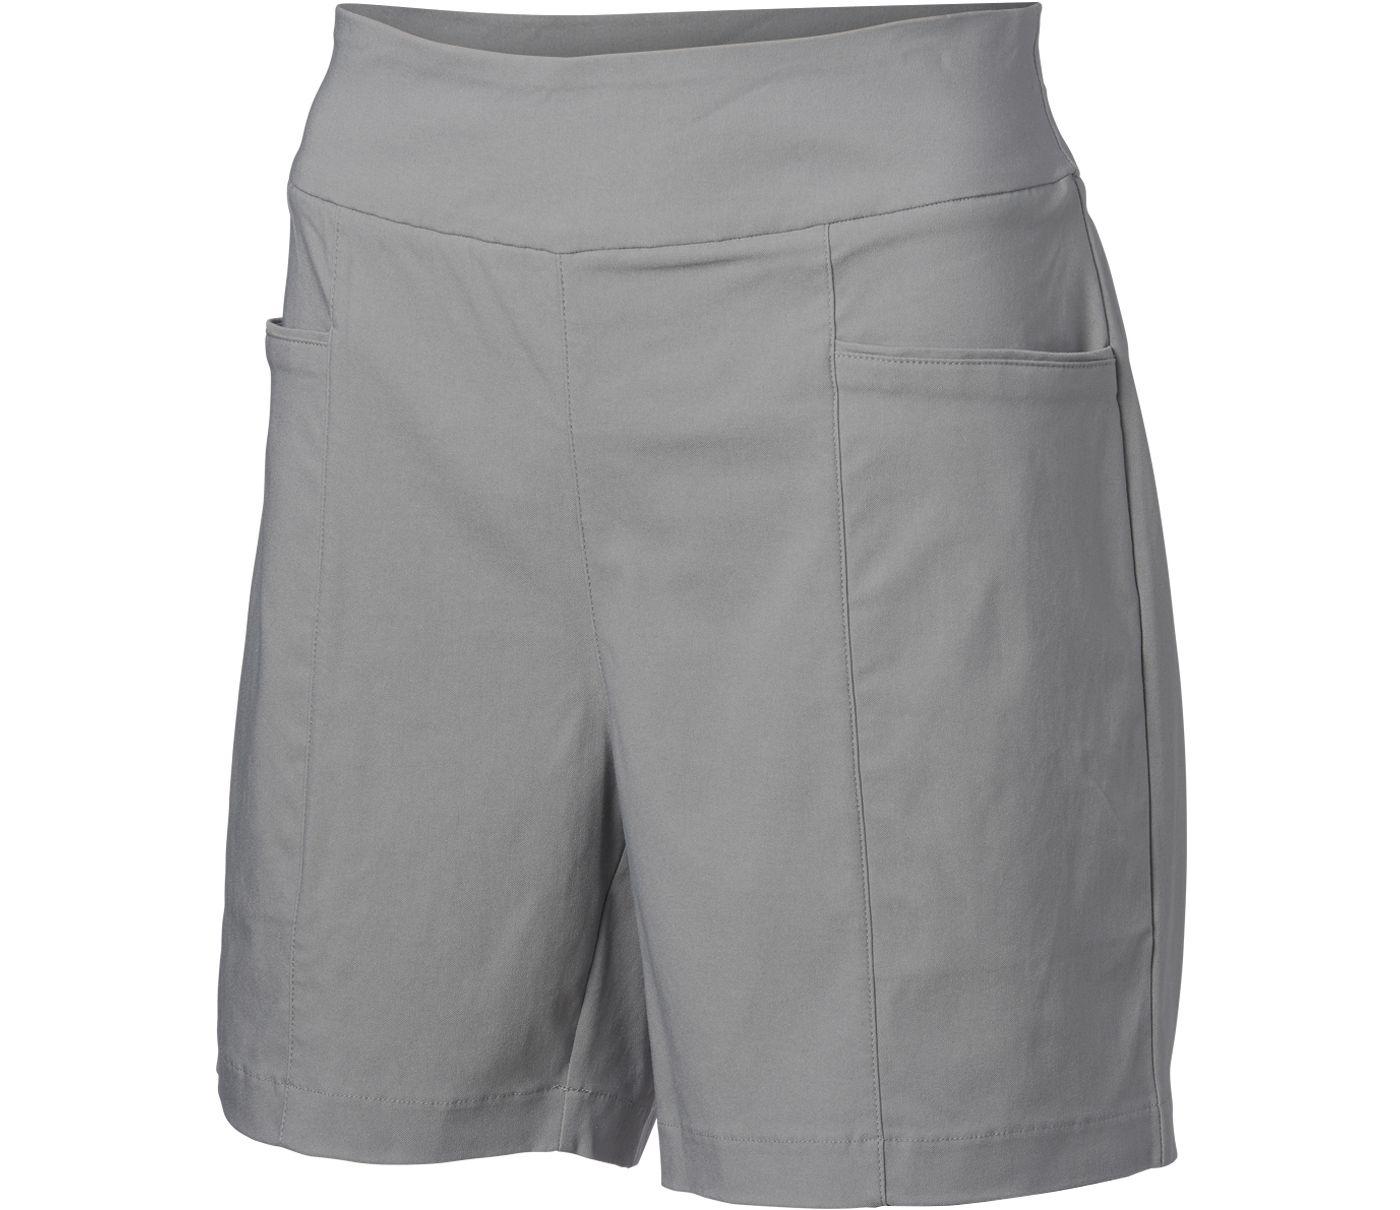 Nancy Lopez Women's Pully Golf Shorts - Plus Size